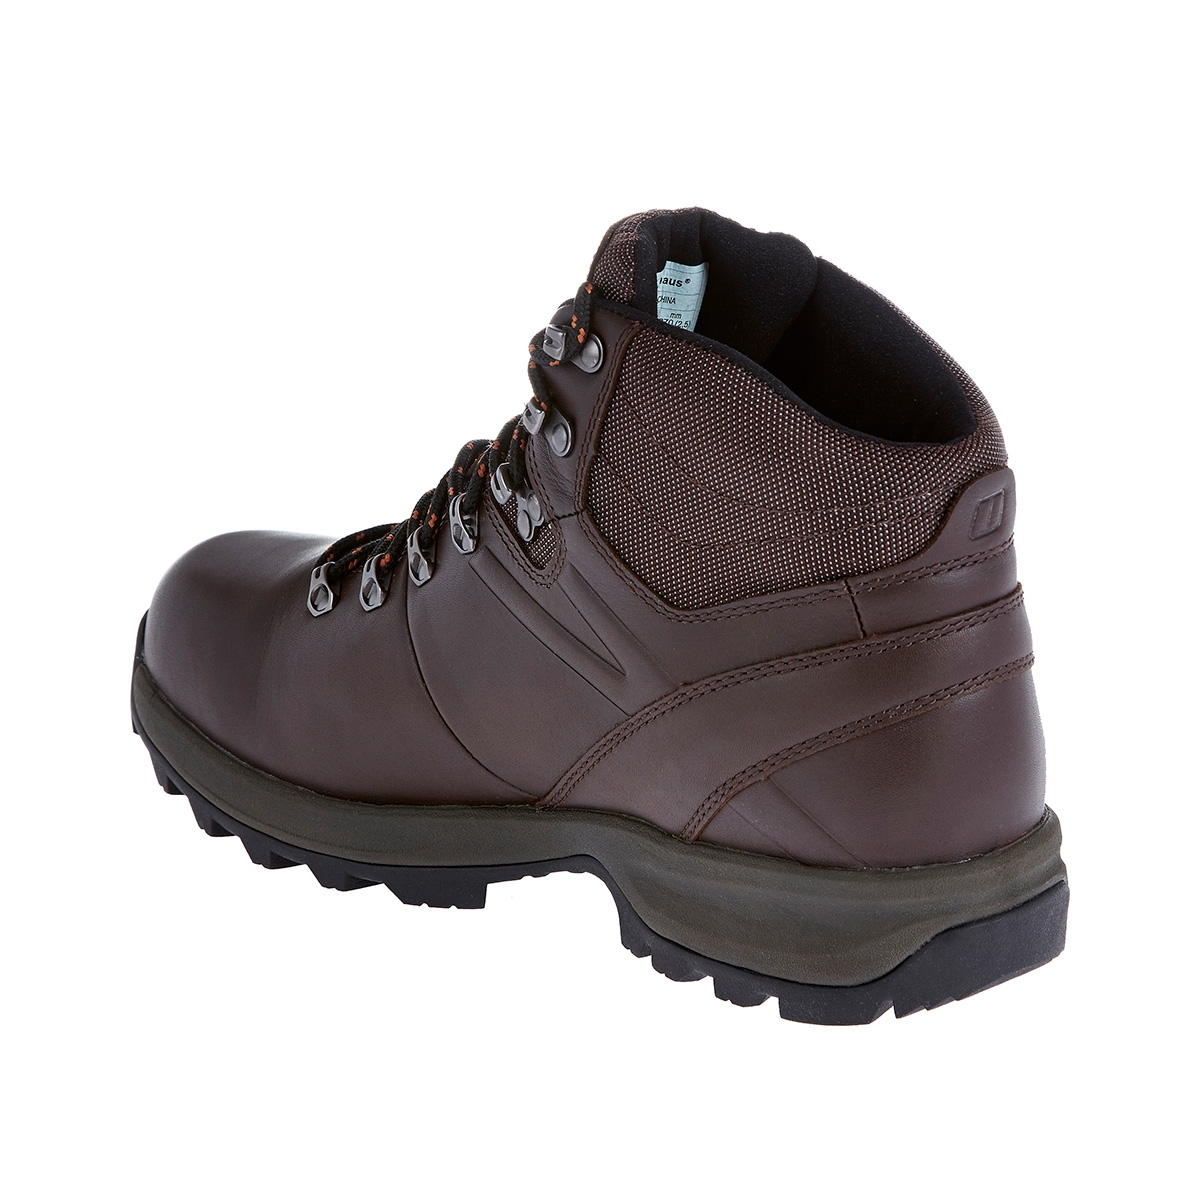 2811516e253 Berghaus Explorer Ridge Plus GTX Walking Boots (Mens) - Brown / Leather  Brown